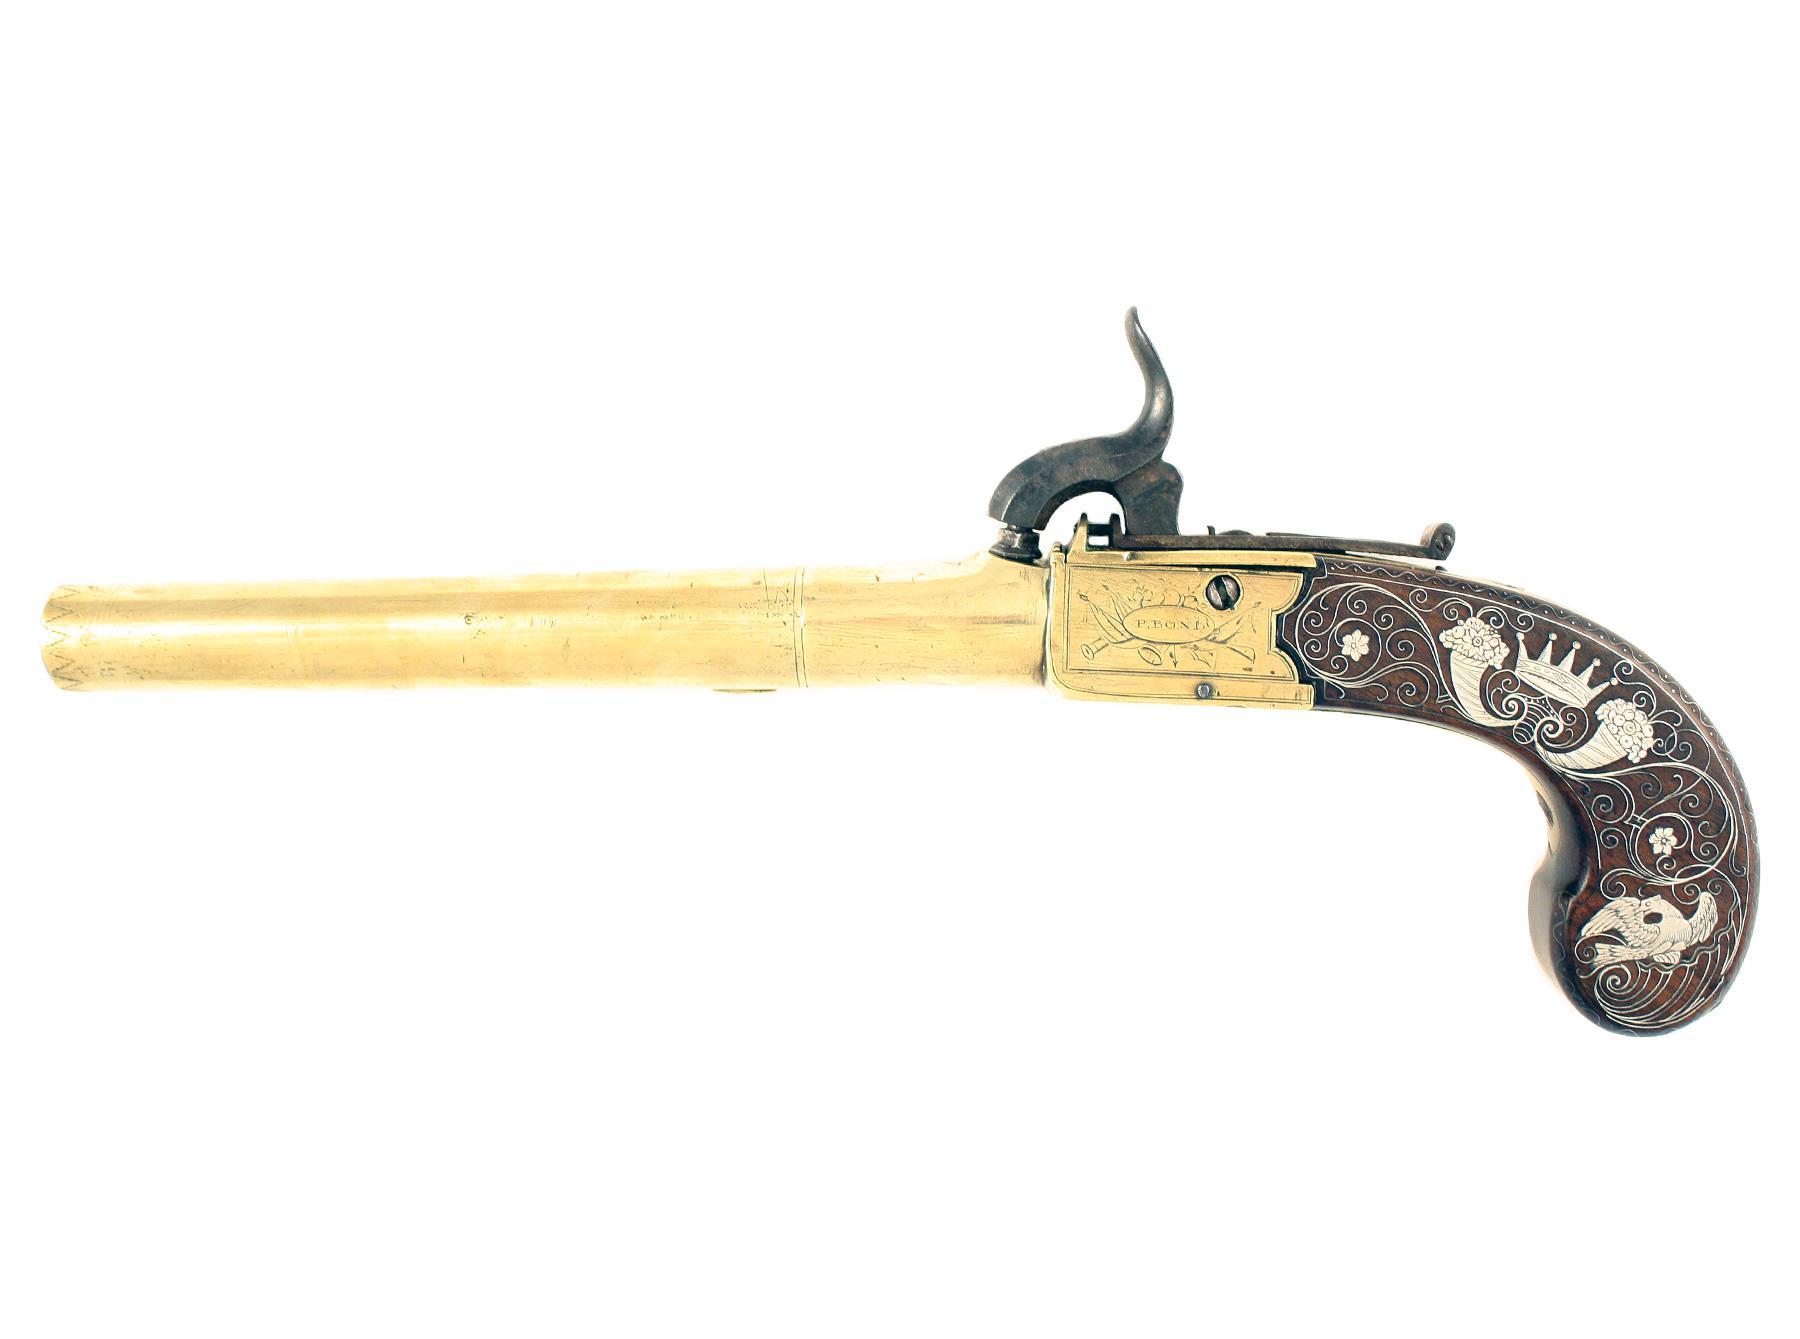 A Silver Mounted Pistol by Bond of London